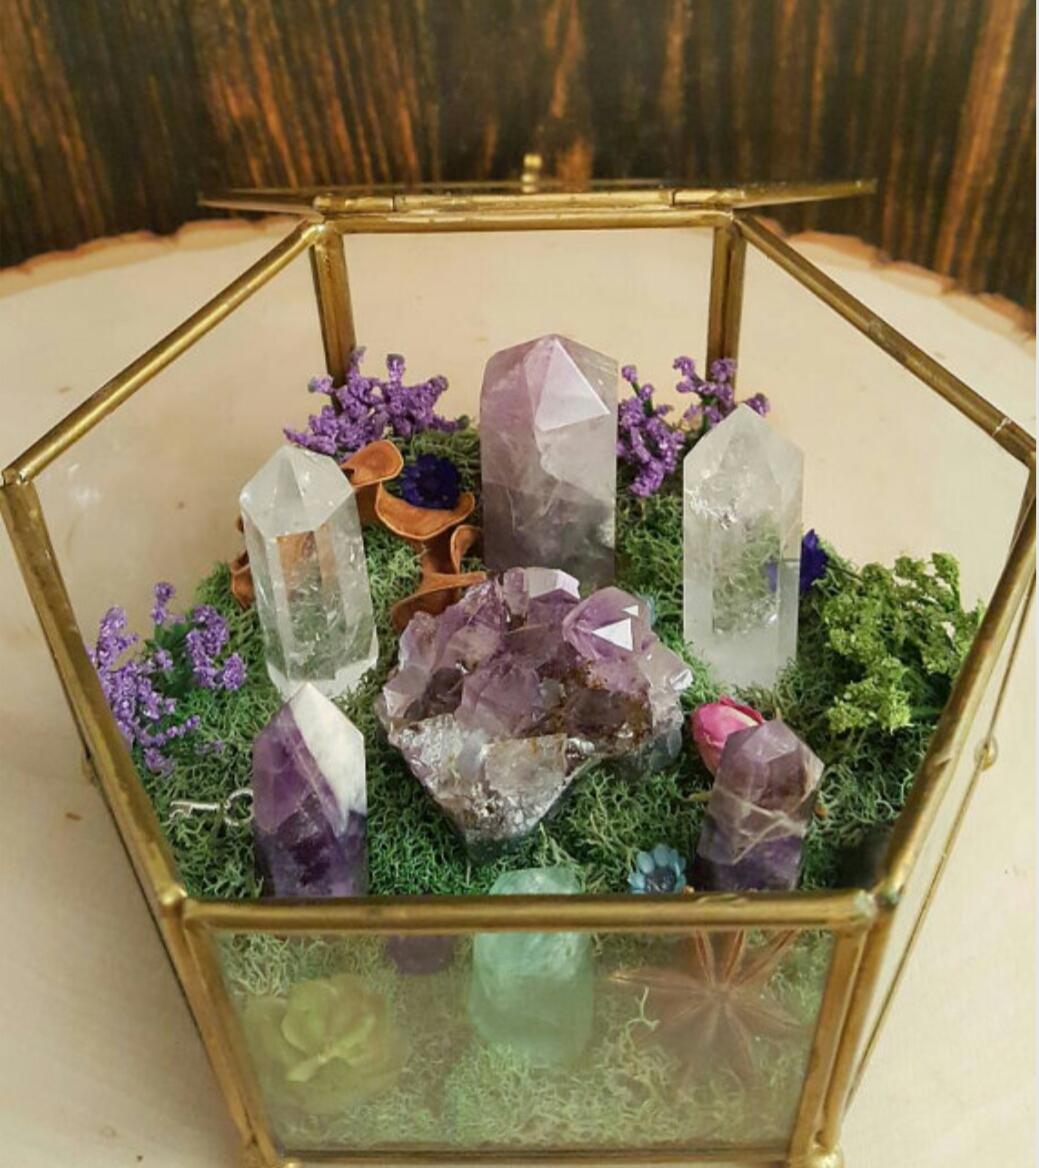 Crystal Garden Terrarium Sold By Wild Witch Crystals On Storenvy